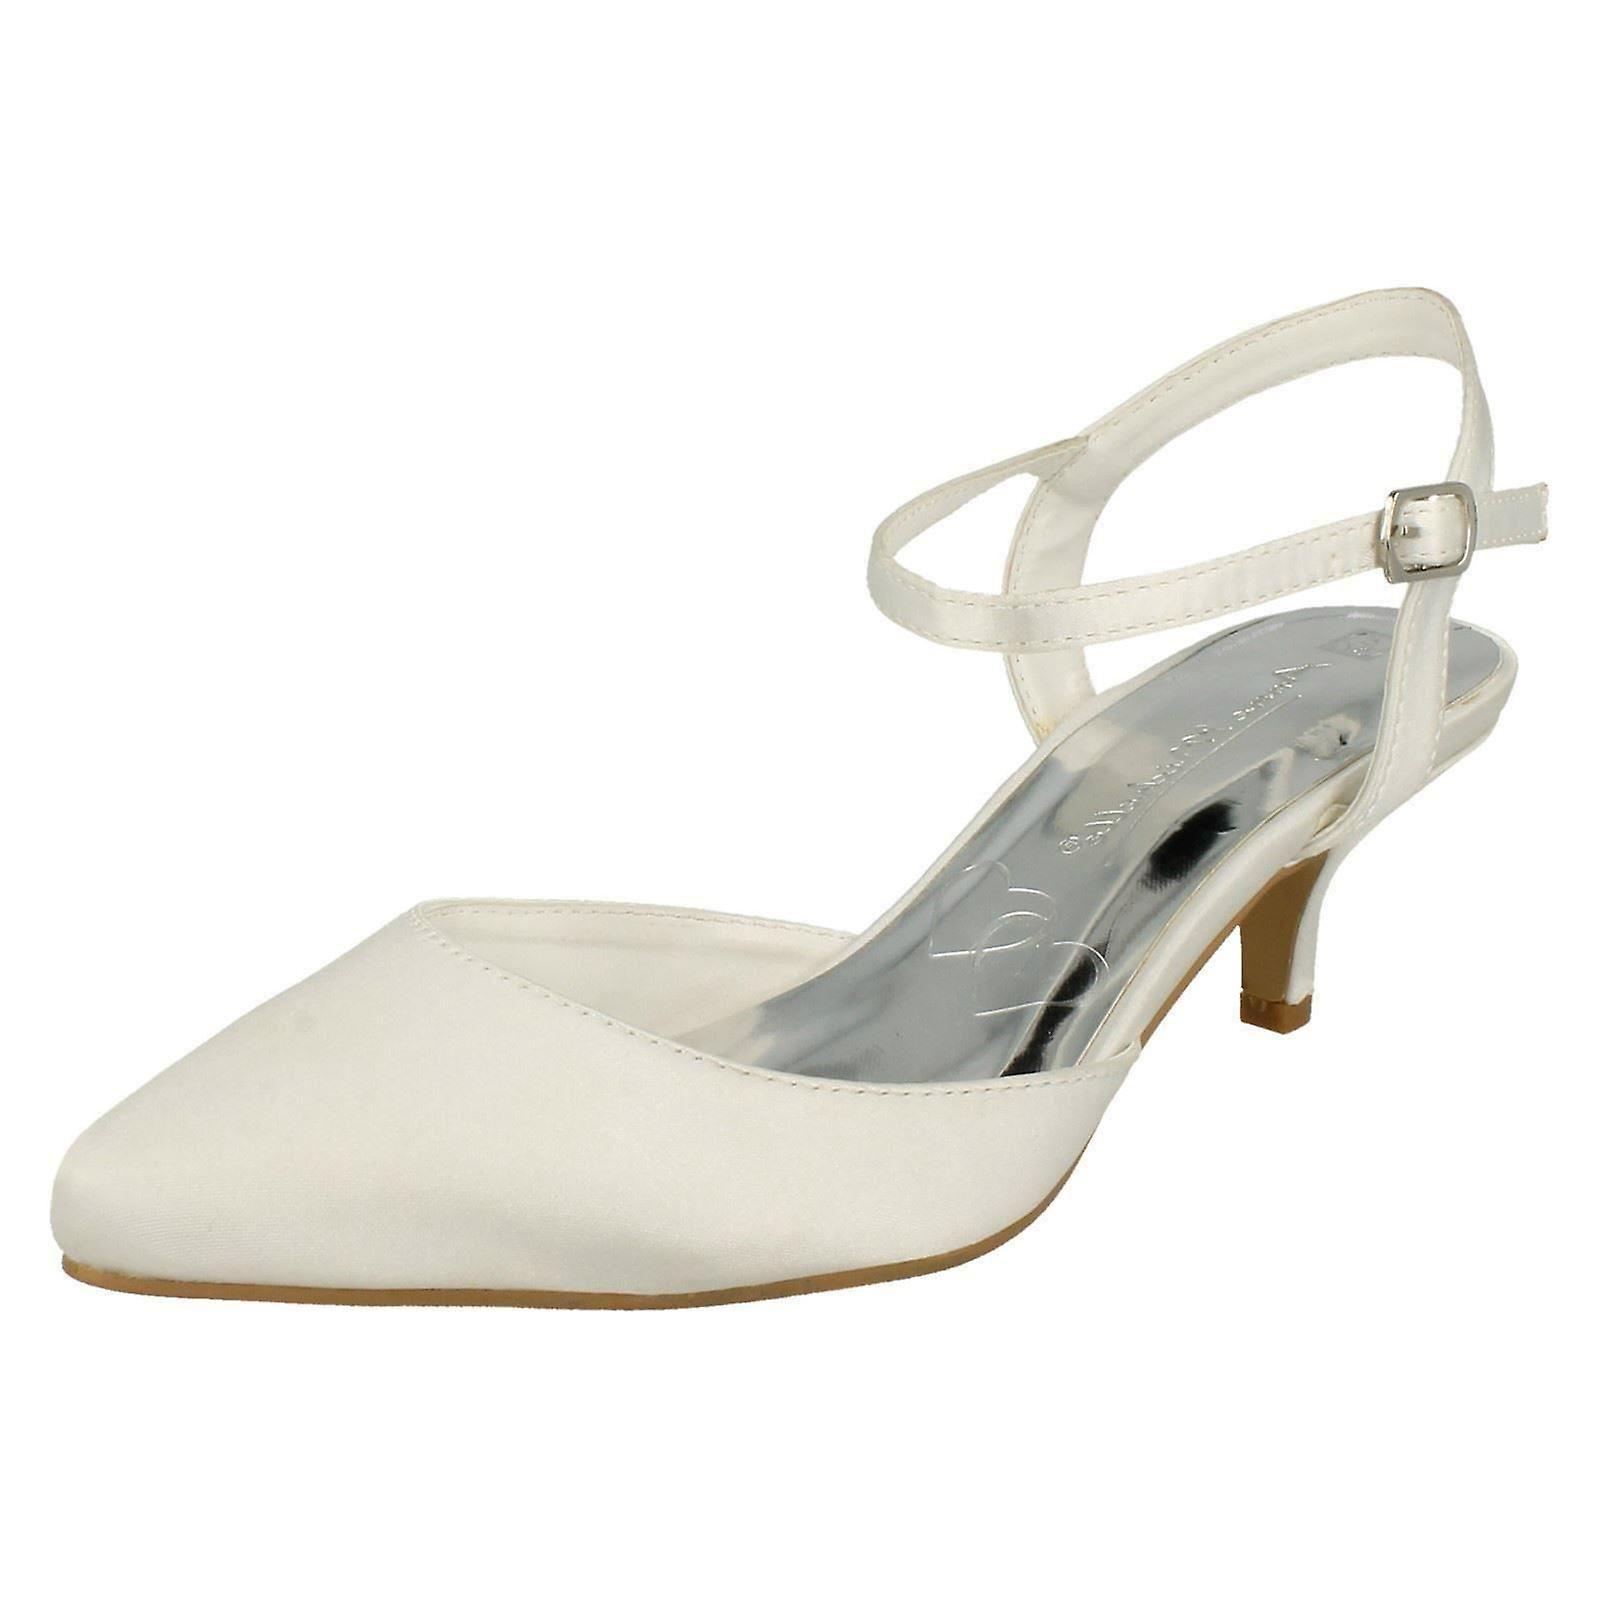 Anne Shoe: Michelle Buckle Up Ankle Strap Party Shoe: Anne Good goods appreciation :Gentlemen/Ladies ecfd92